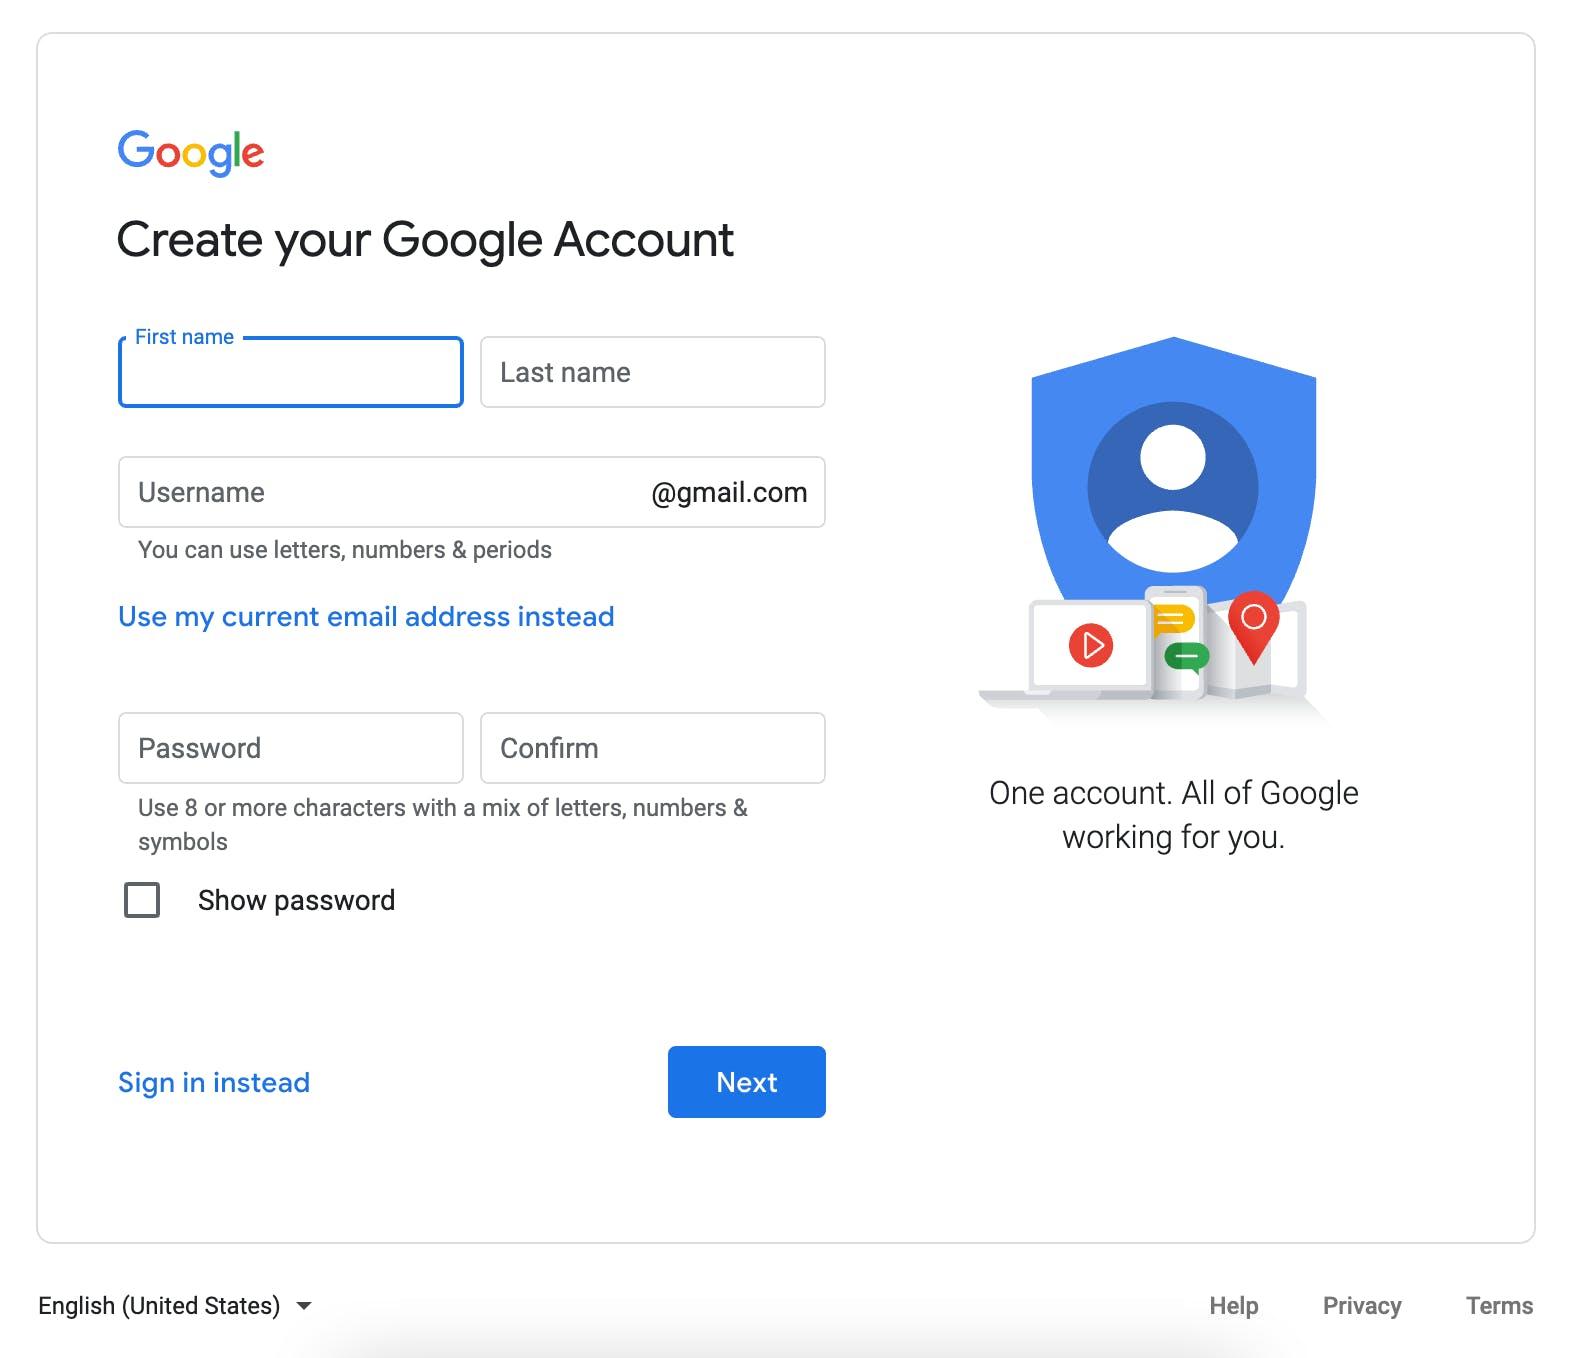 Final screen during Google create an account process